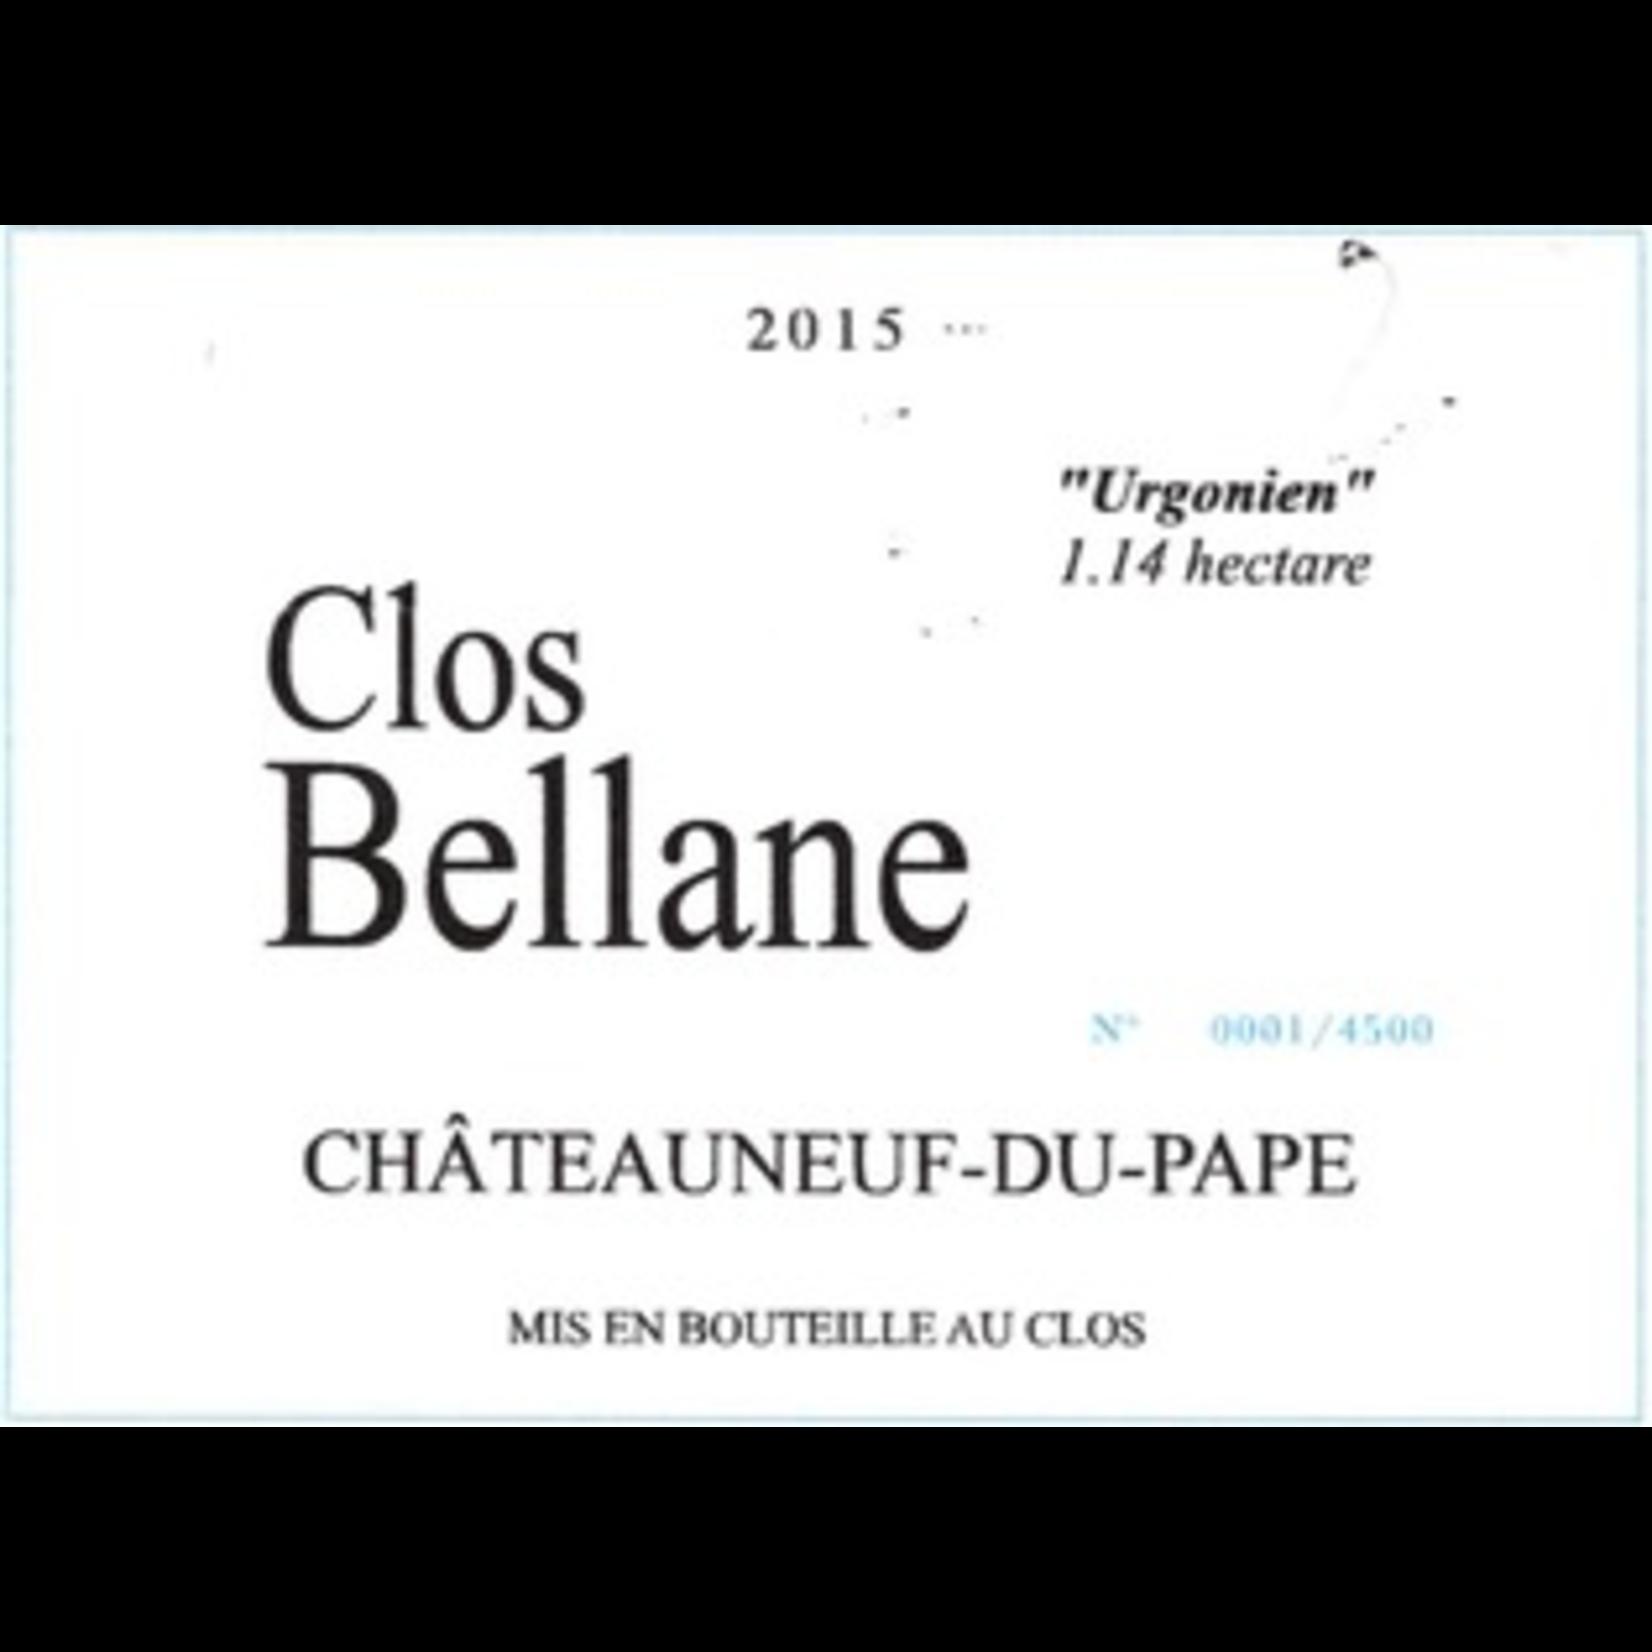 Clos Bellane Chateauneuf du Pape Urgonien 1.14 hectare 2016